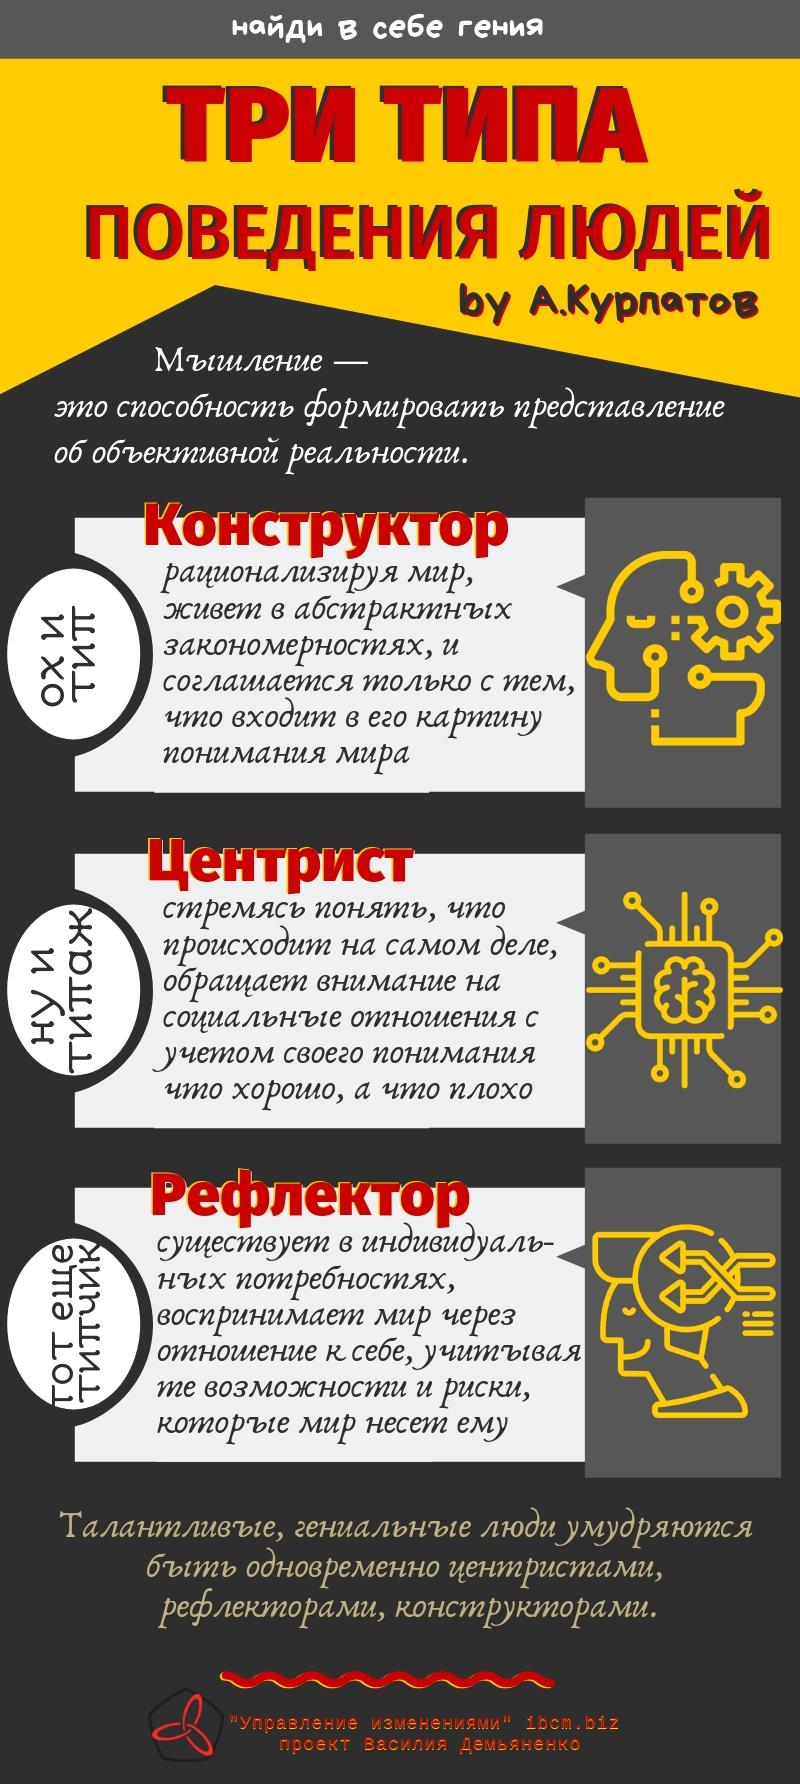 Центристы рефлекторы конструкторы Курпатов